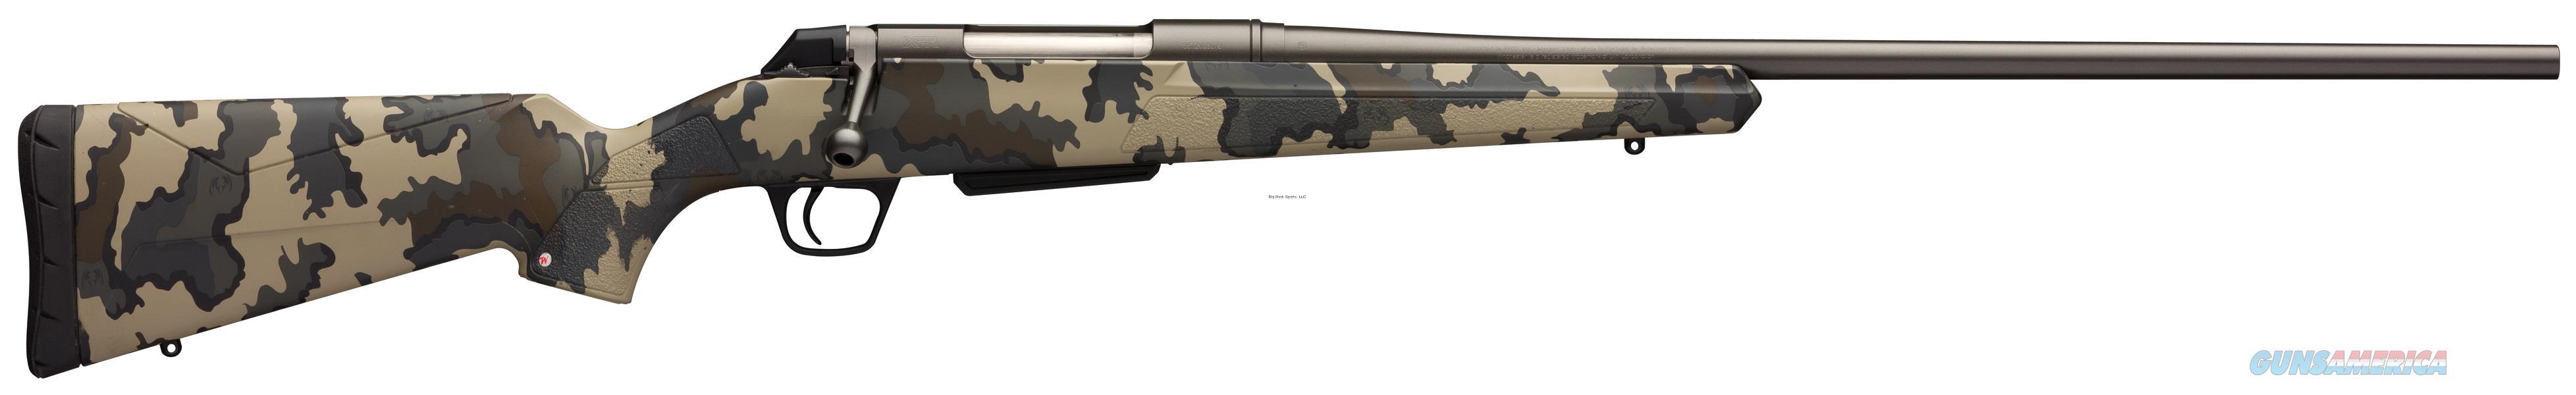 "Winchester Xpr Hunter Vias Bolt Action Rifle, 325 Wsm, 24"" Bbl, Permacote Gray Barrel, Vias Camo Stock 535713277  Guns > Rifles > W Misc Rifles"